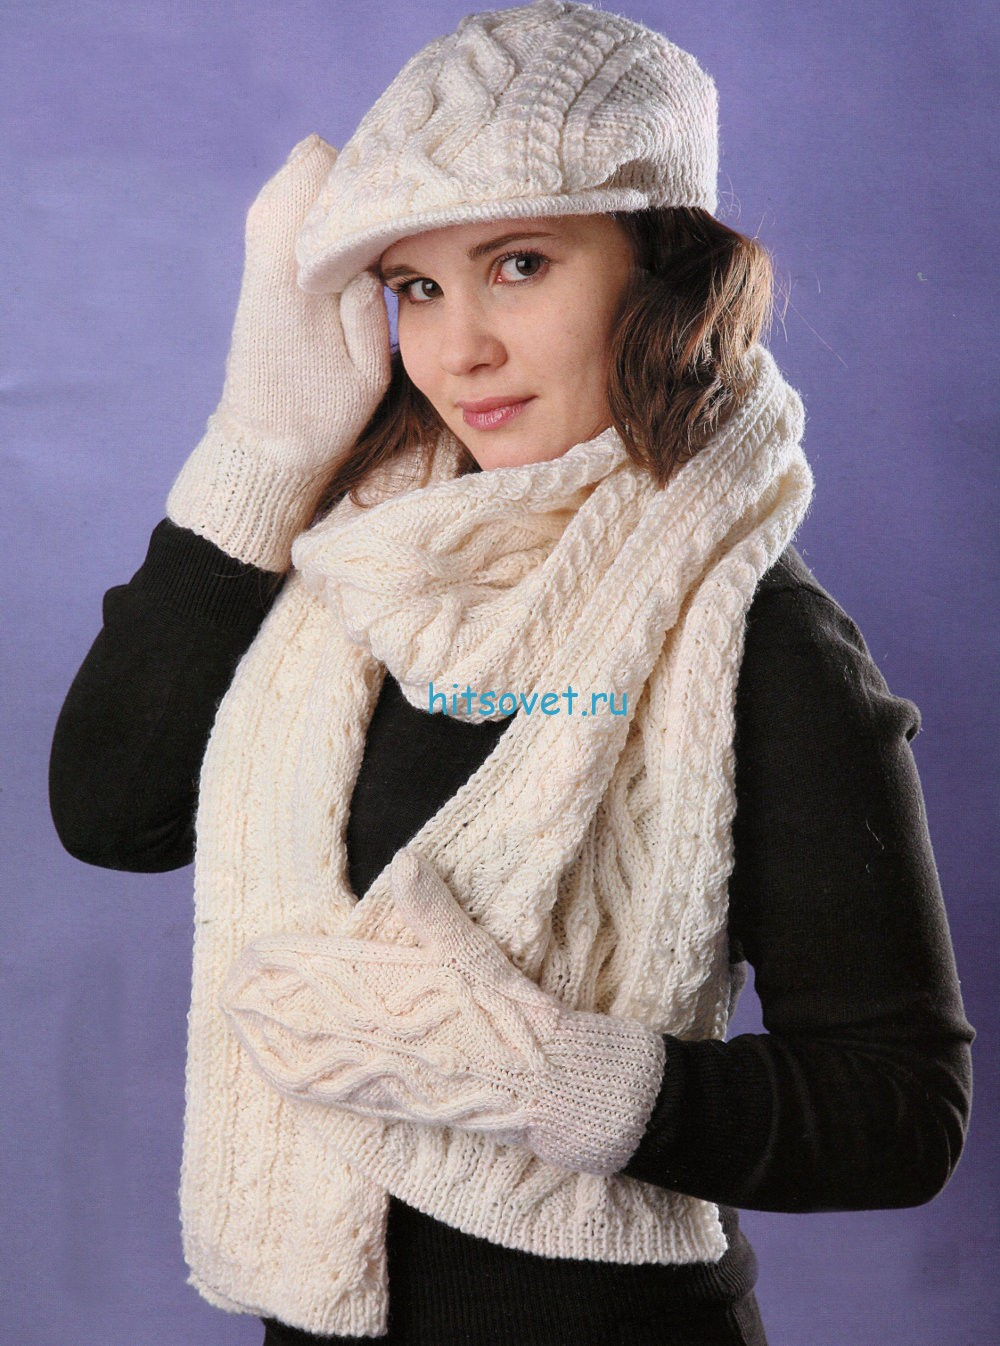 Вязание кепи, шарфа и варежек